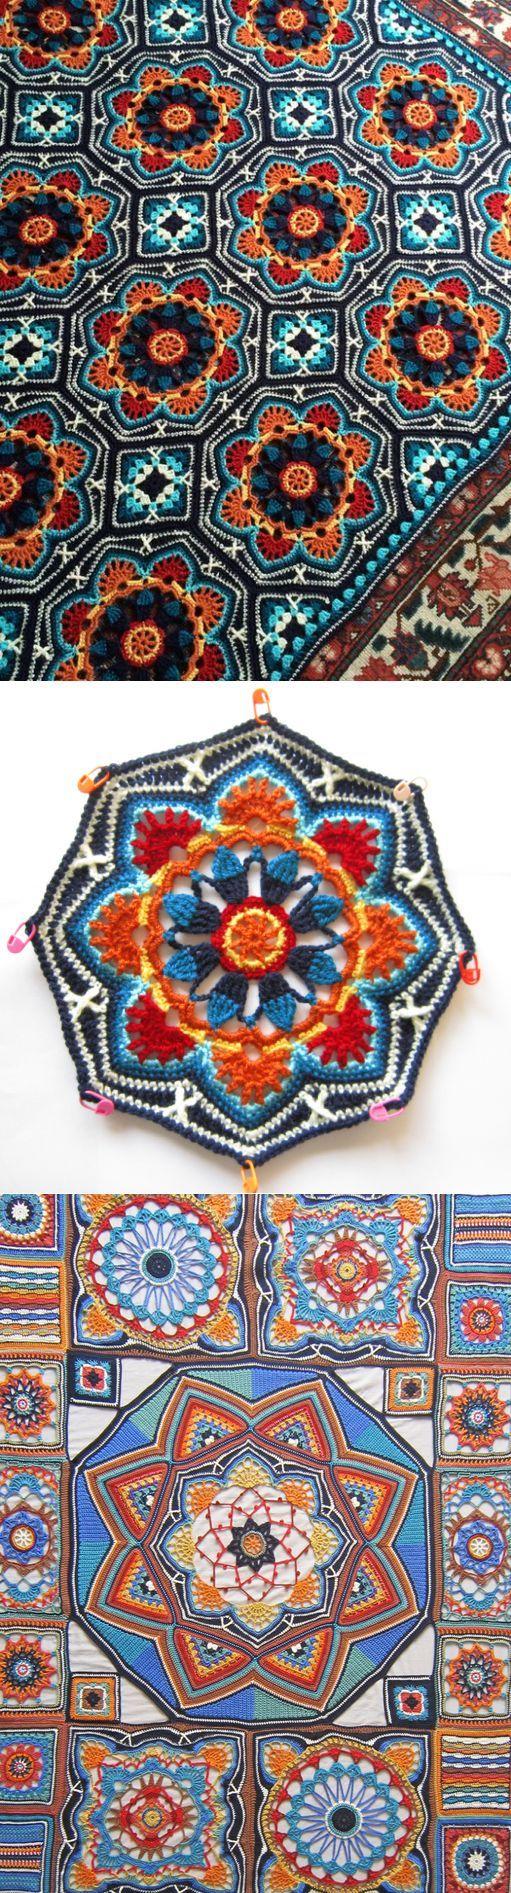 Las mantas | Puntadas de crochet | Pinterest | Häkeln, Decken und ...